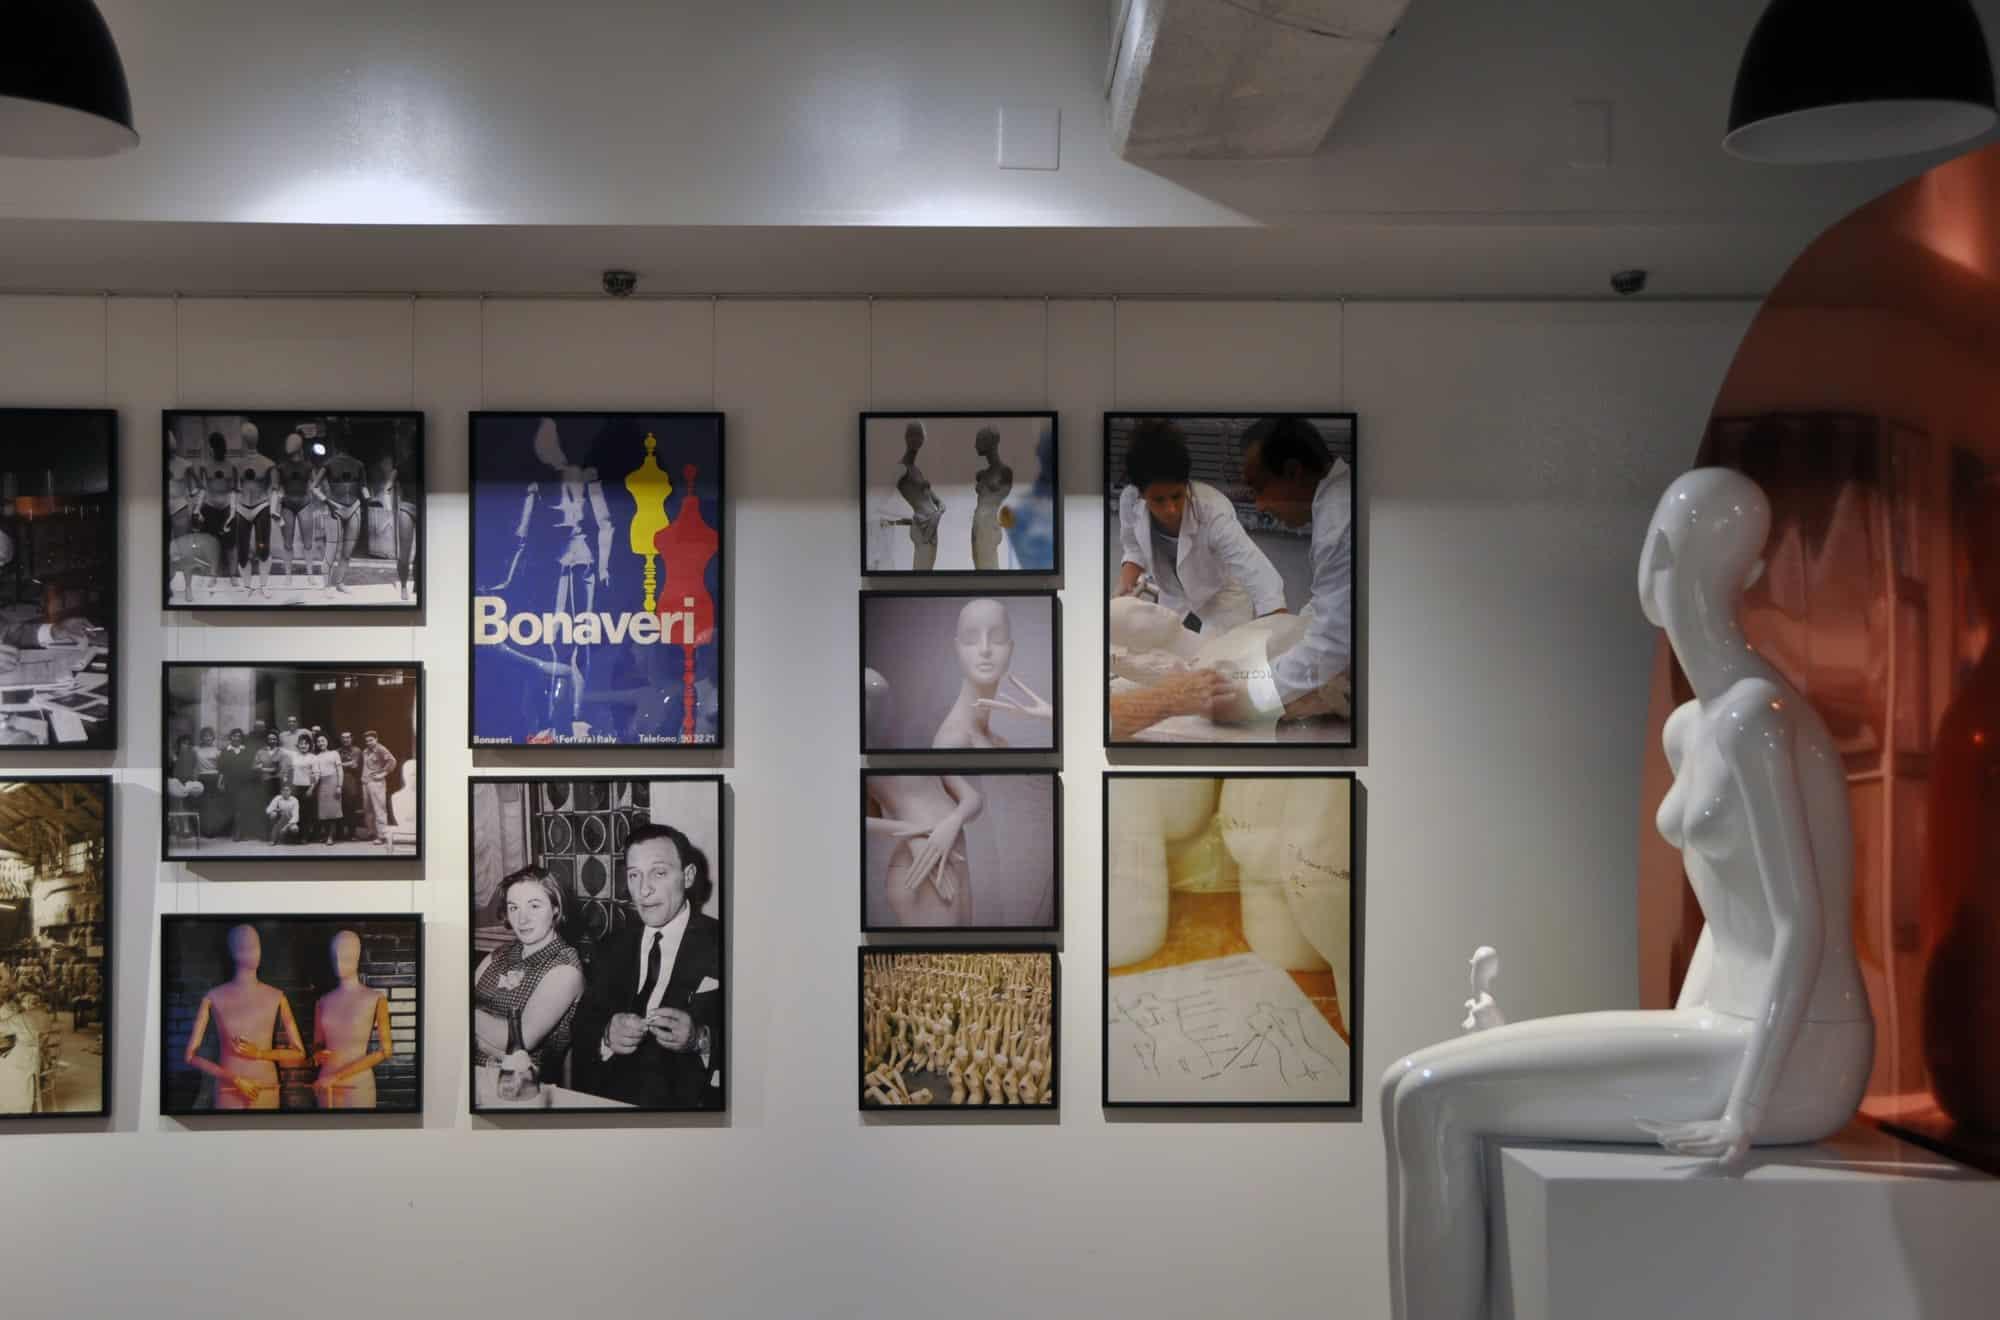 bonaveri mannequin exhibition tokyo japan